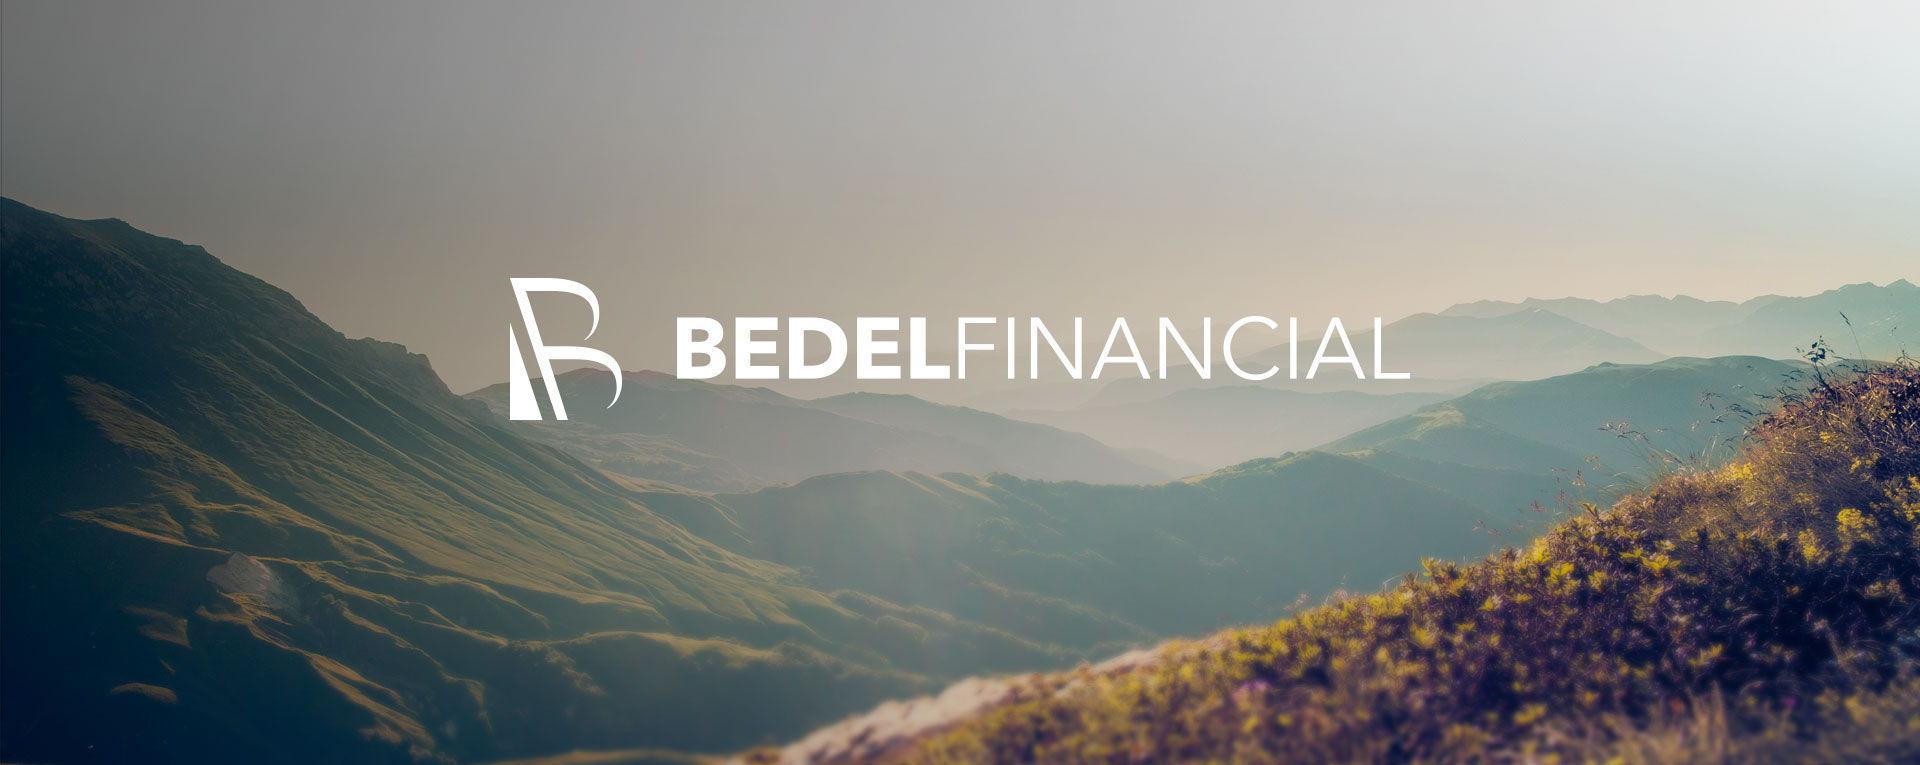 Bedel Banner